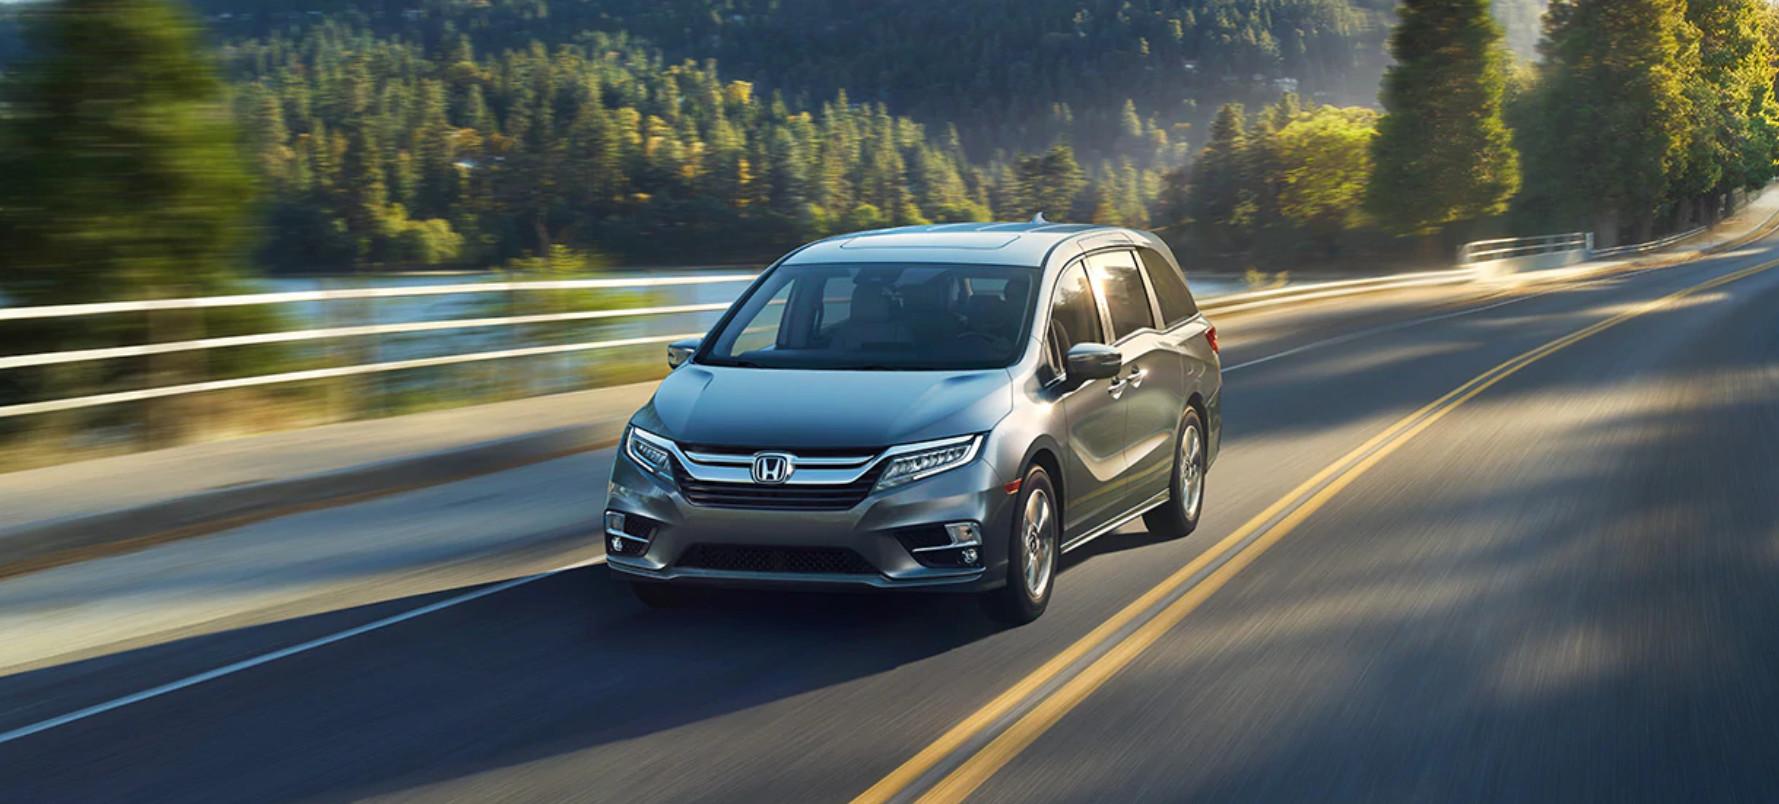 2020 Honda Odyssey for Sale near Milton, DE